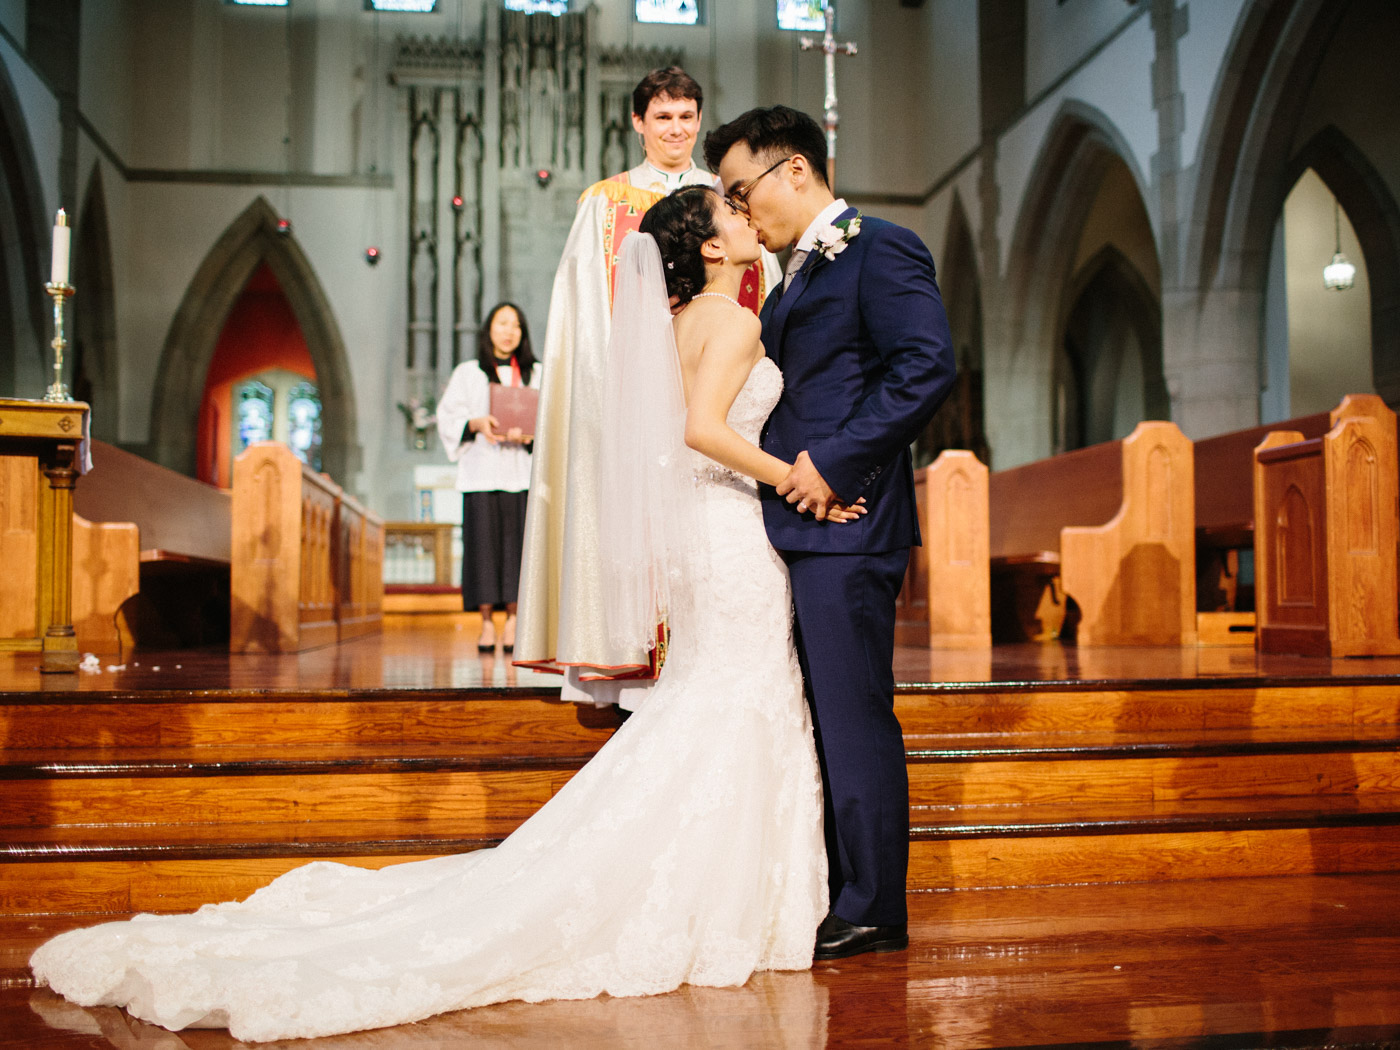 toronto_wedding_photographer_fine_art_documentary_photography-68.jpg